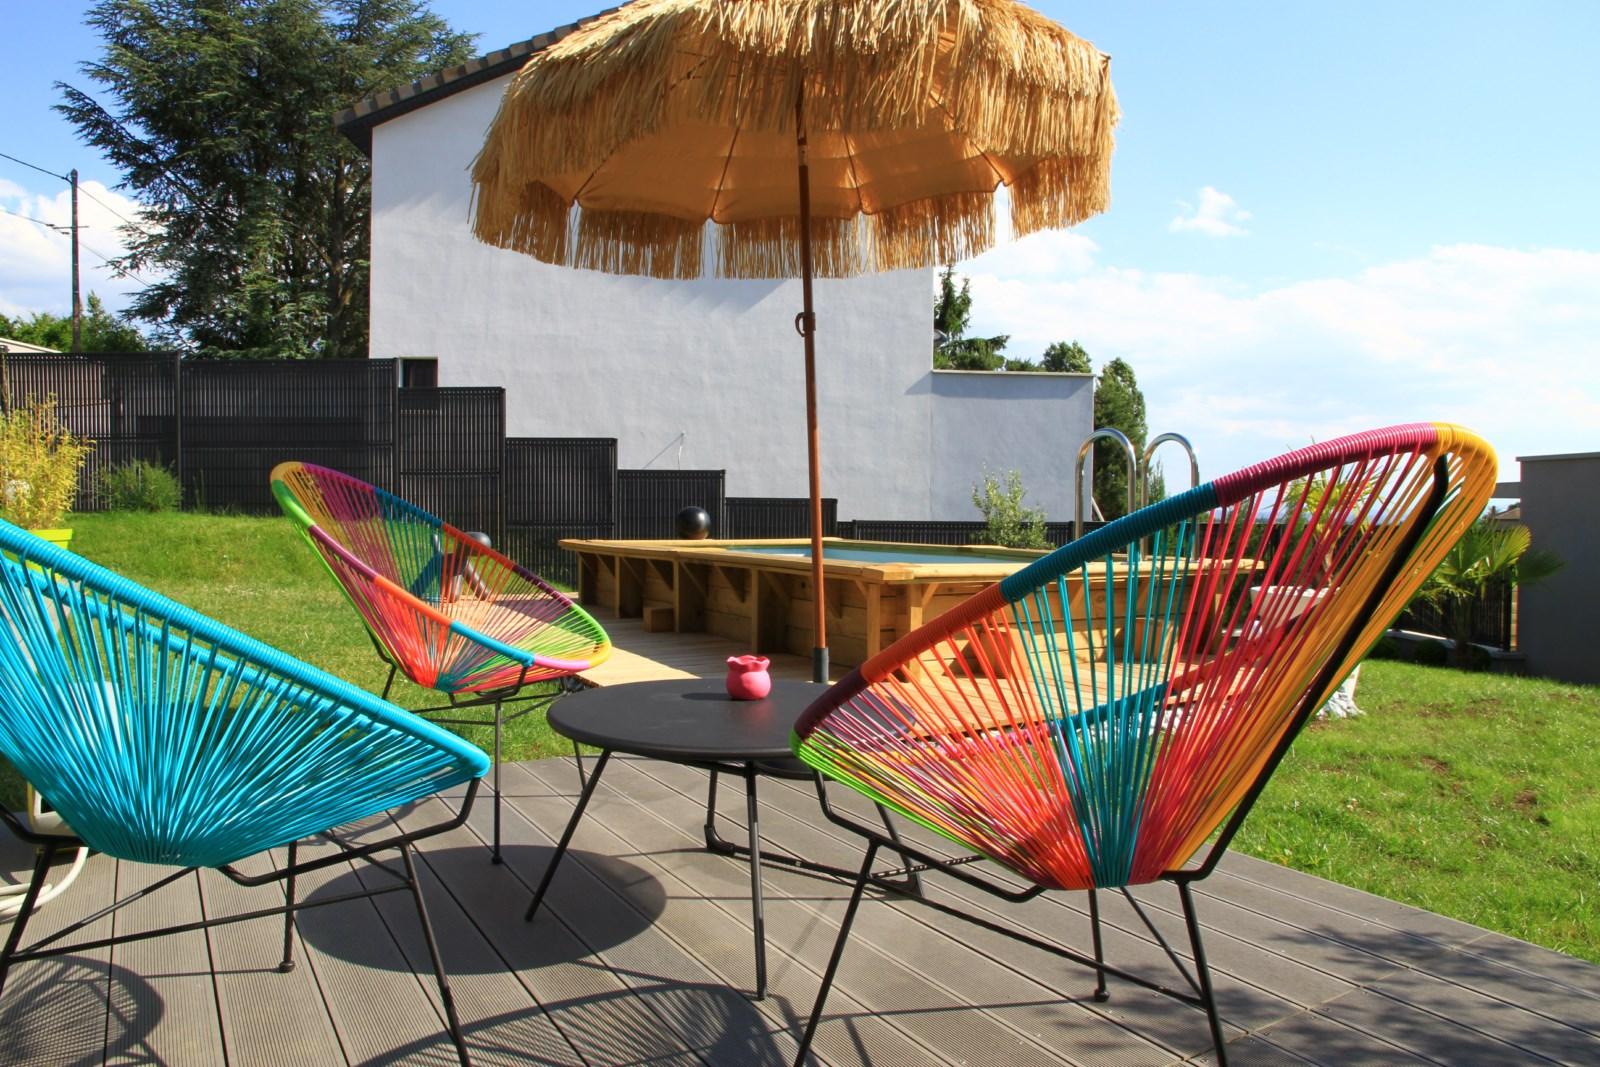 pisciniste expert dardilly dans le rh ne paysagiste dardilly lyon les jardins de l 39 ouest. Black Bedroom Furniture Sets. Home Design Ideas